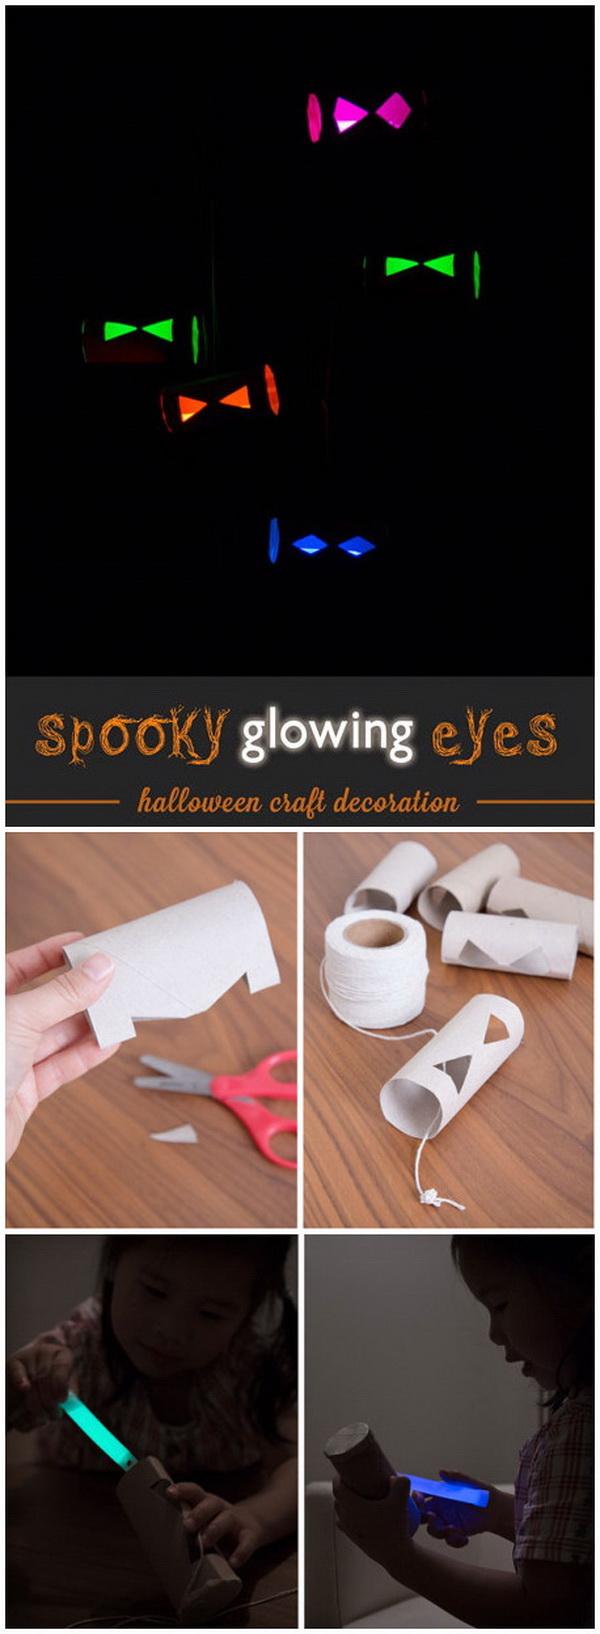 Spooky Glowing Eyes. Creepy glow-in-the-dark eyes! Another easy halloween craft for older kids!